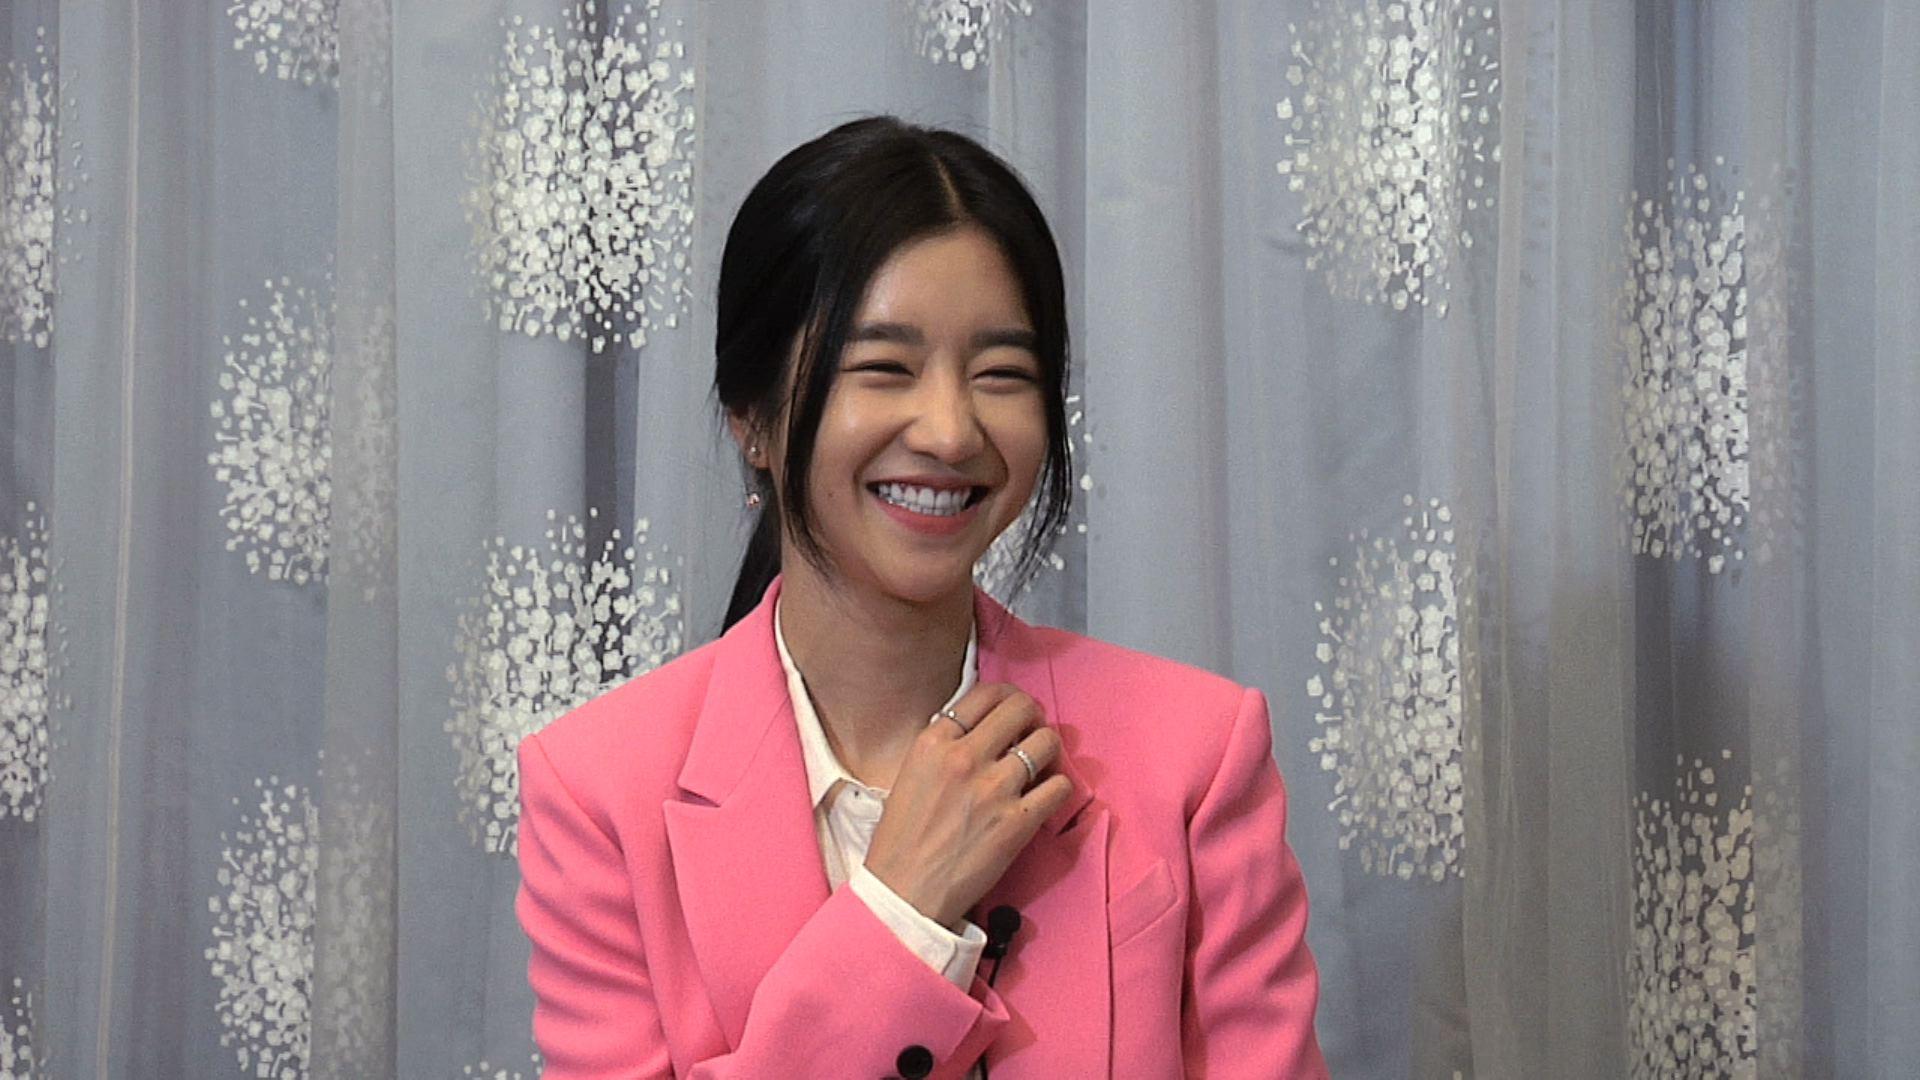 Seo Ye Ji Quantum Physics - Seo Ye Ji Fans